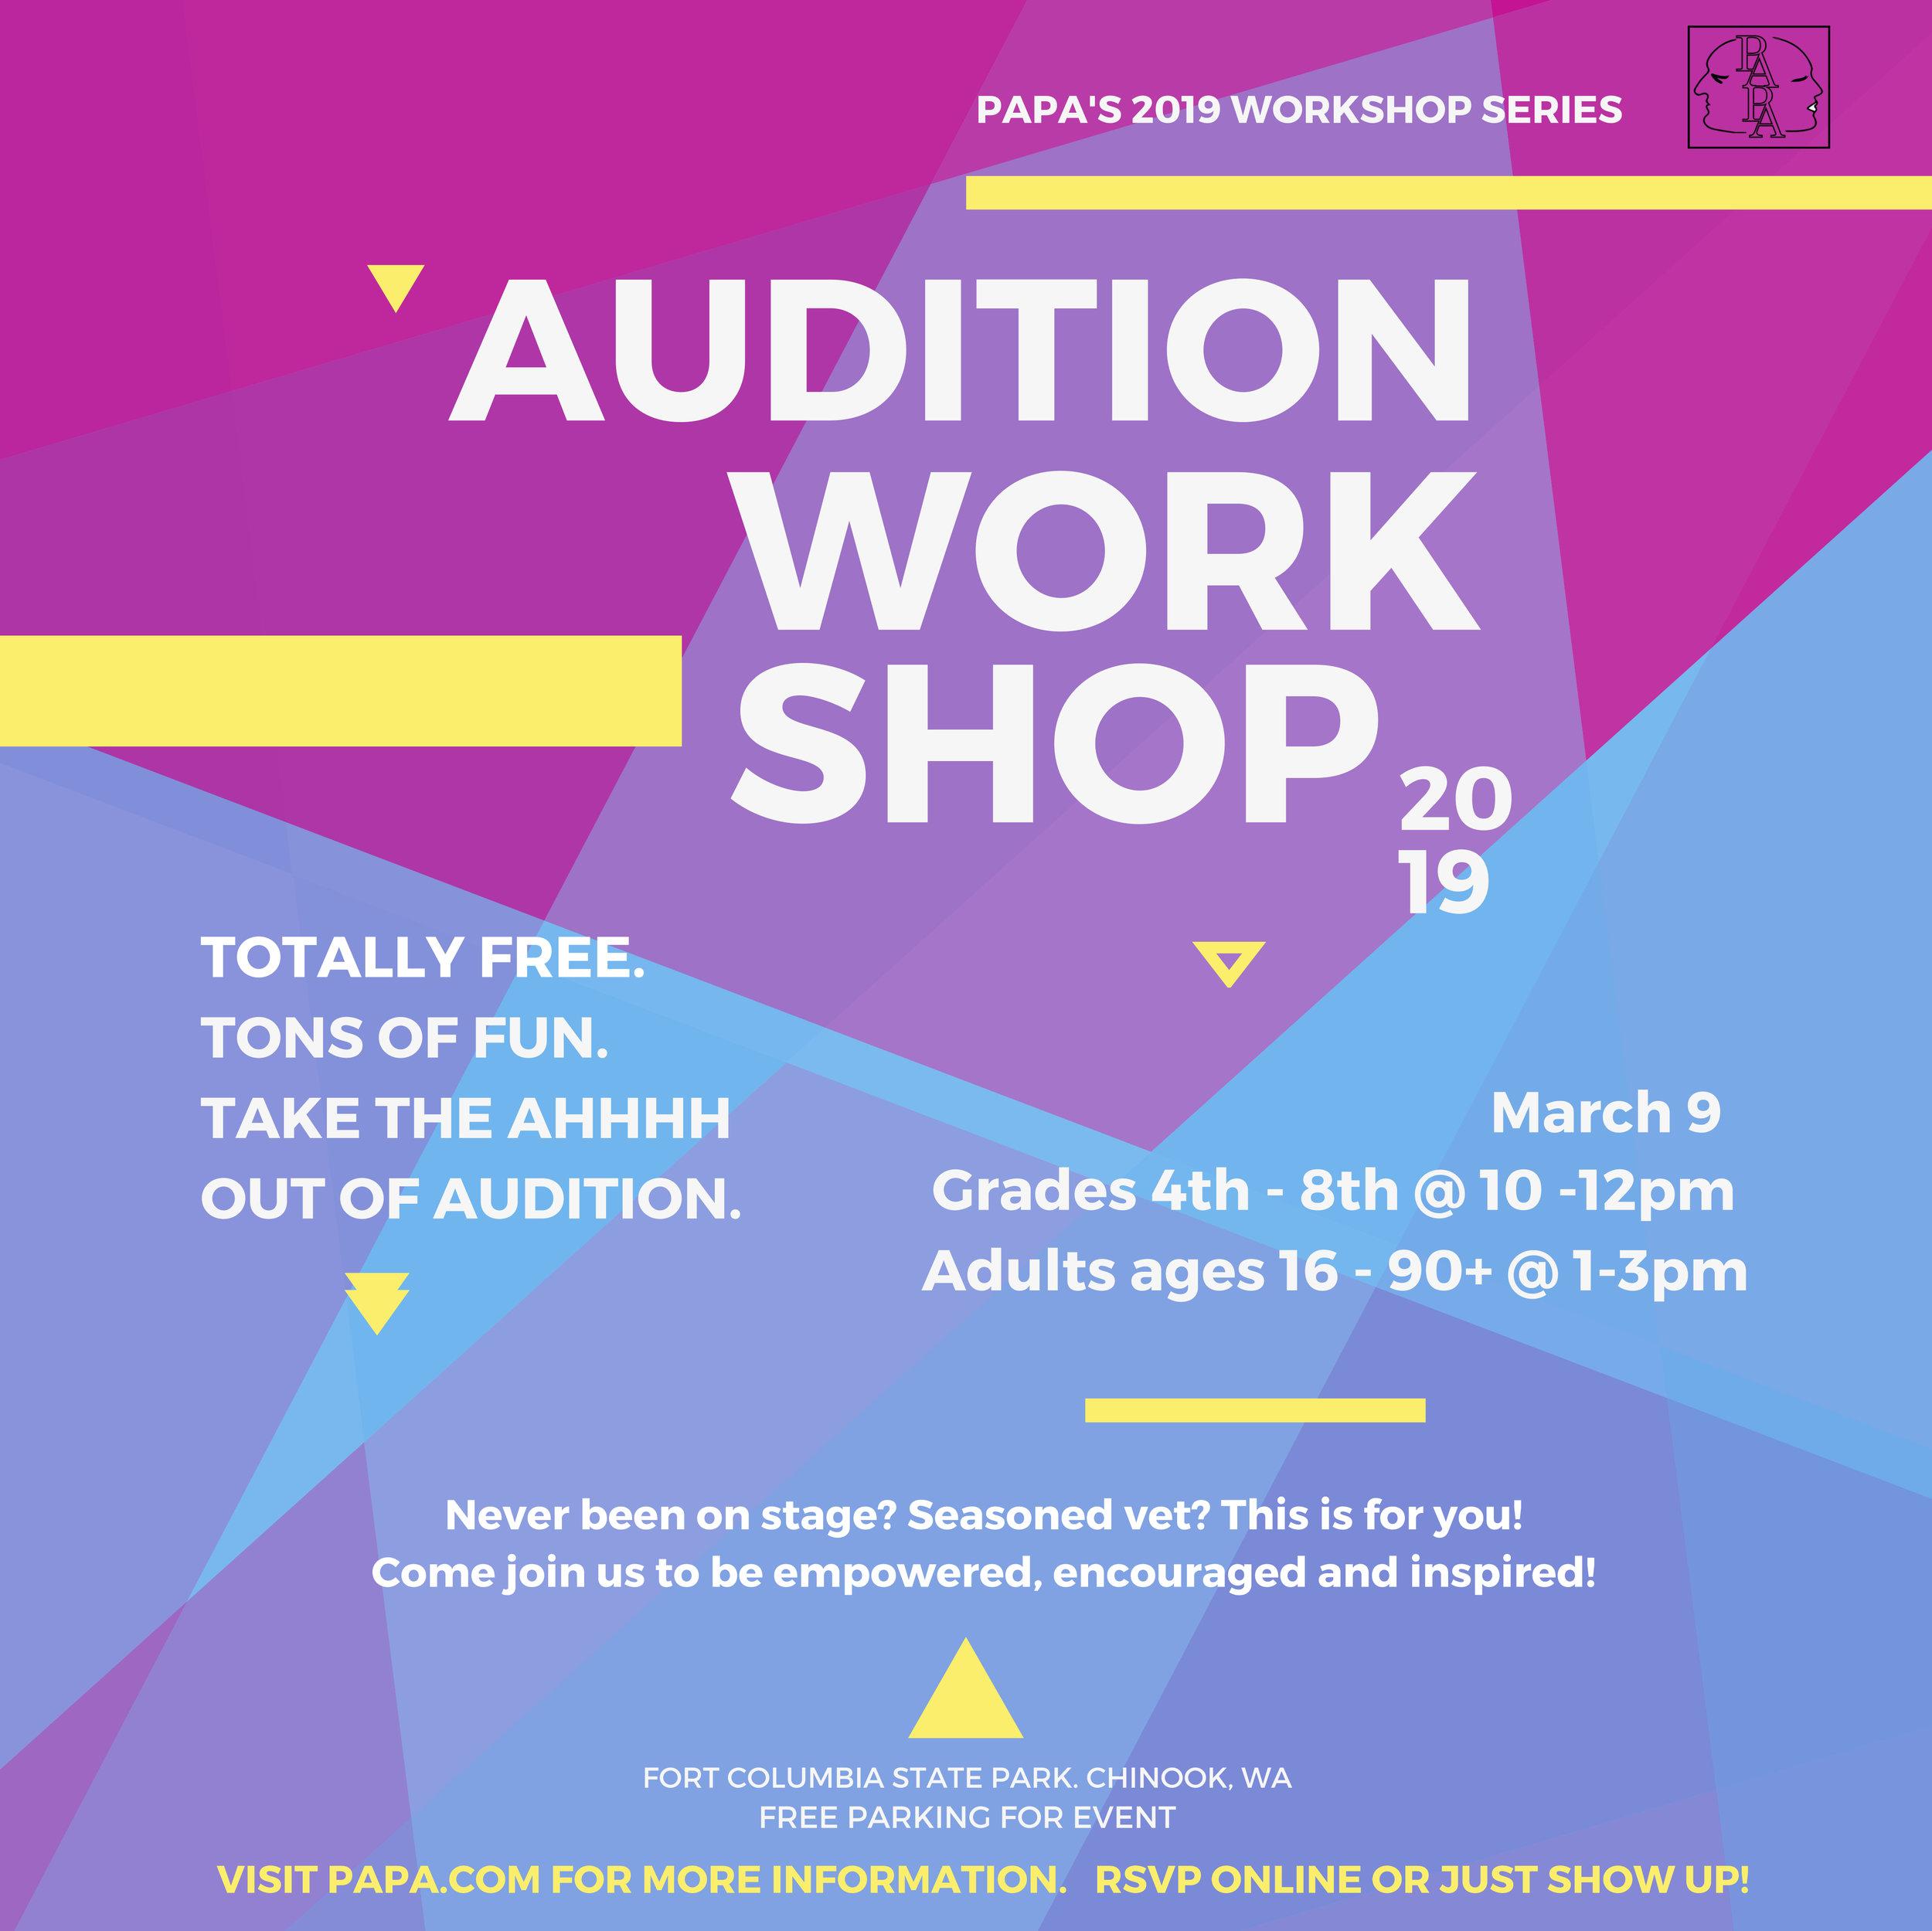 PAPA Social Media audition workshop.jpg